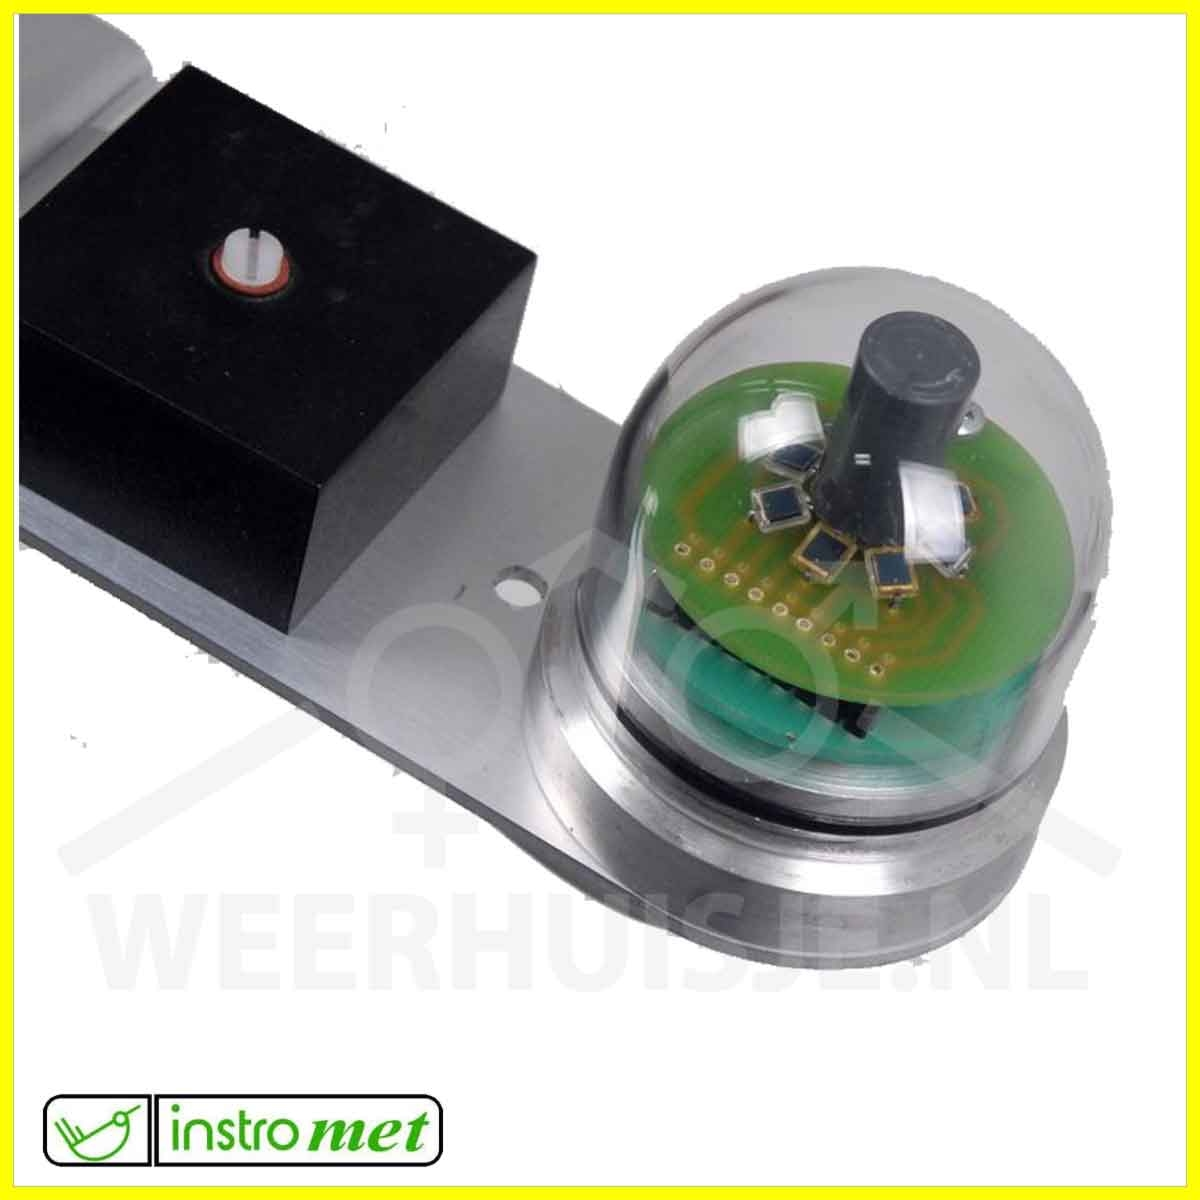 IM-Sun-webmb-solar Instromet zonuren sensor pack. Solar.